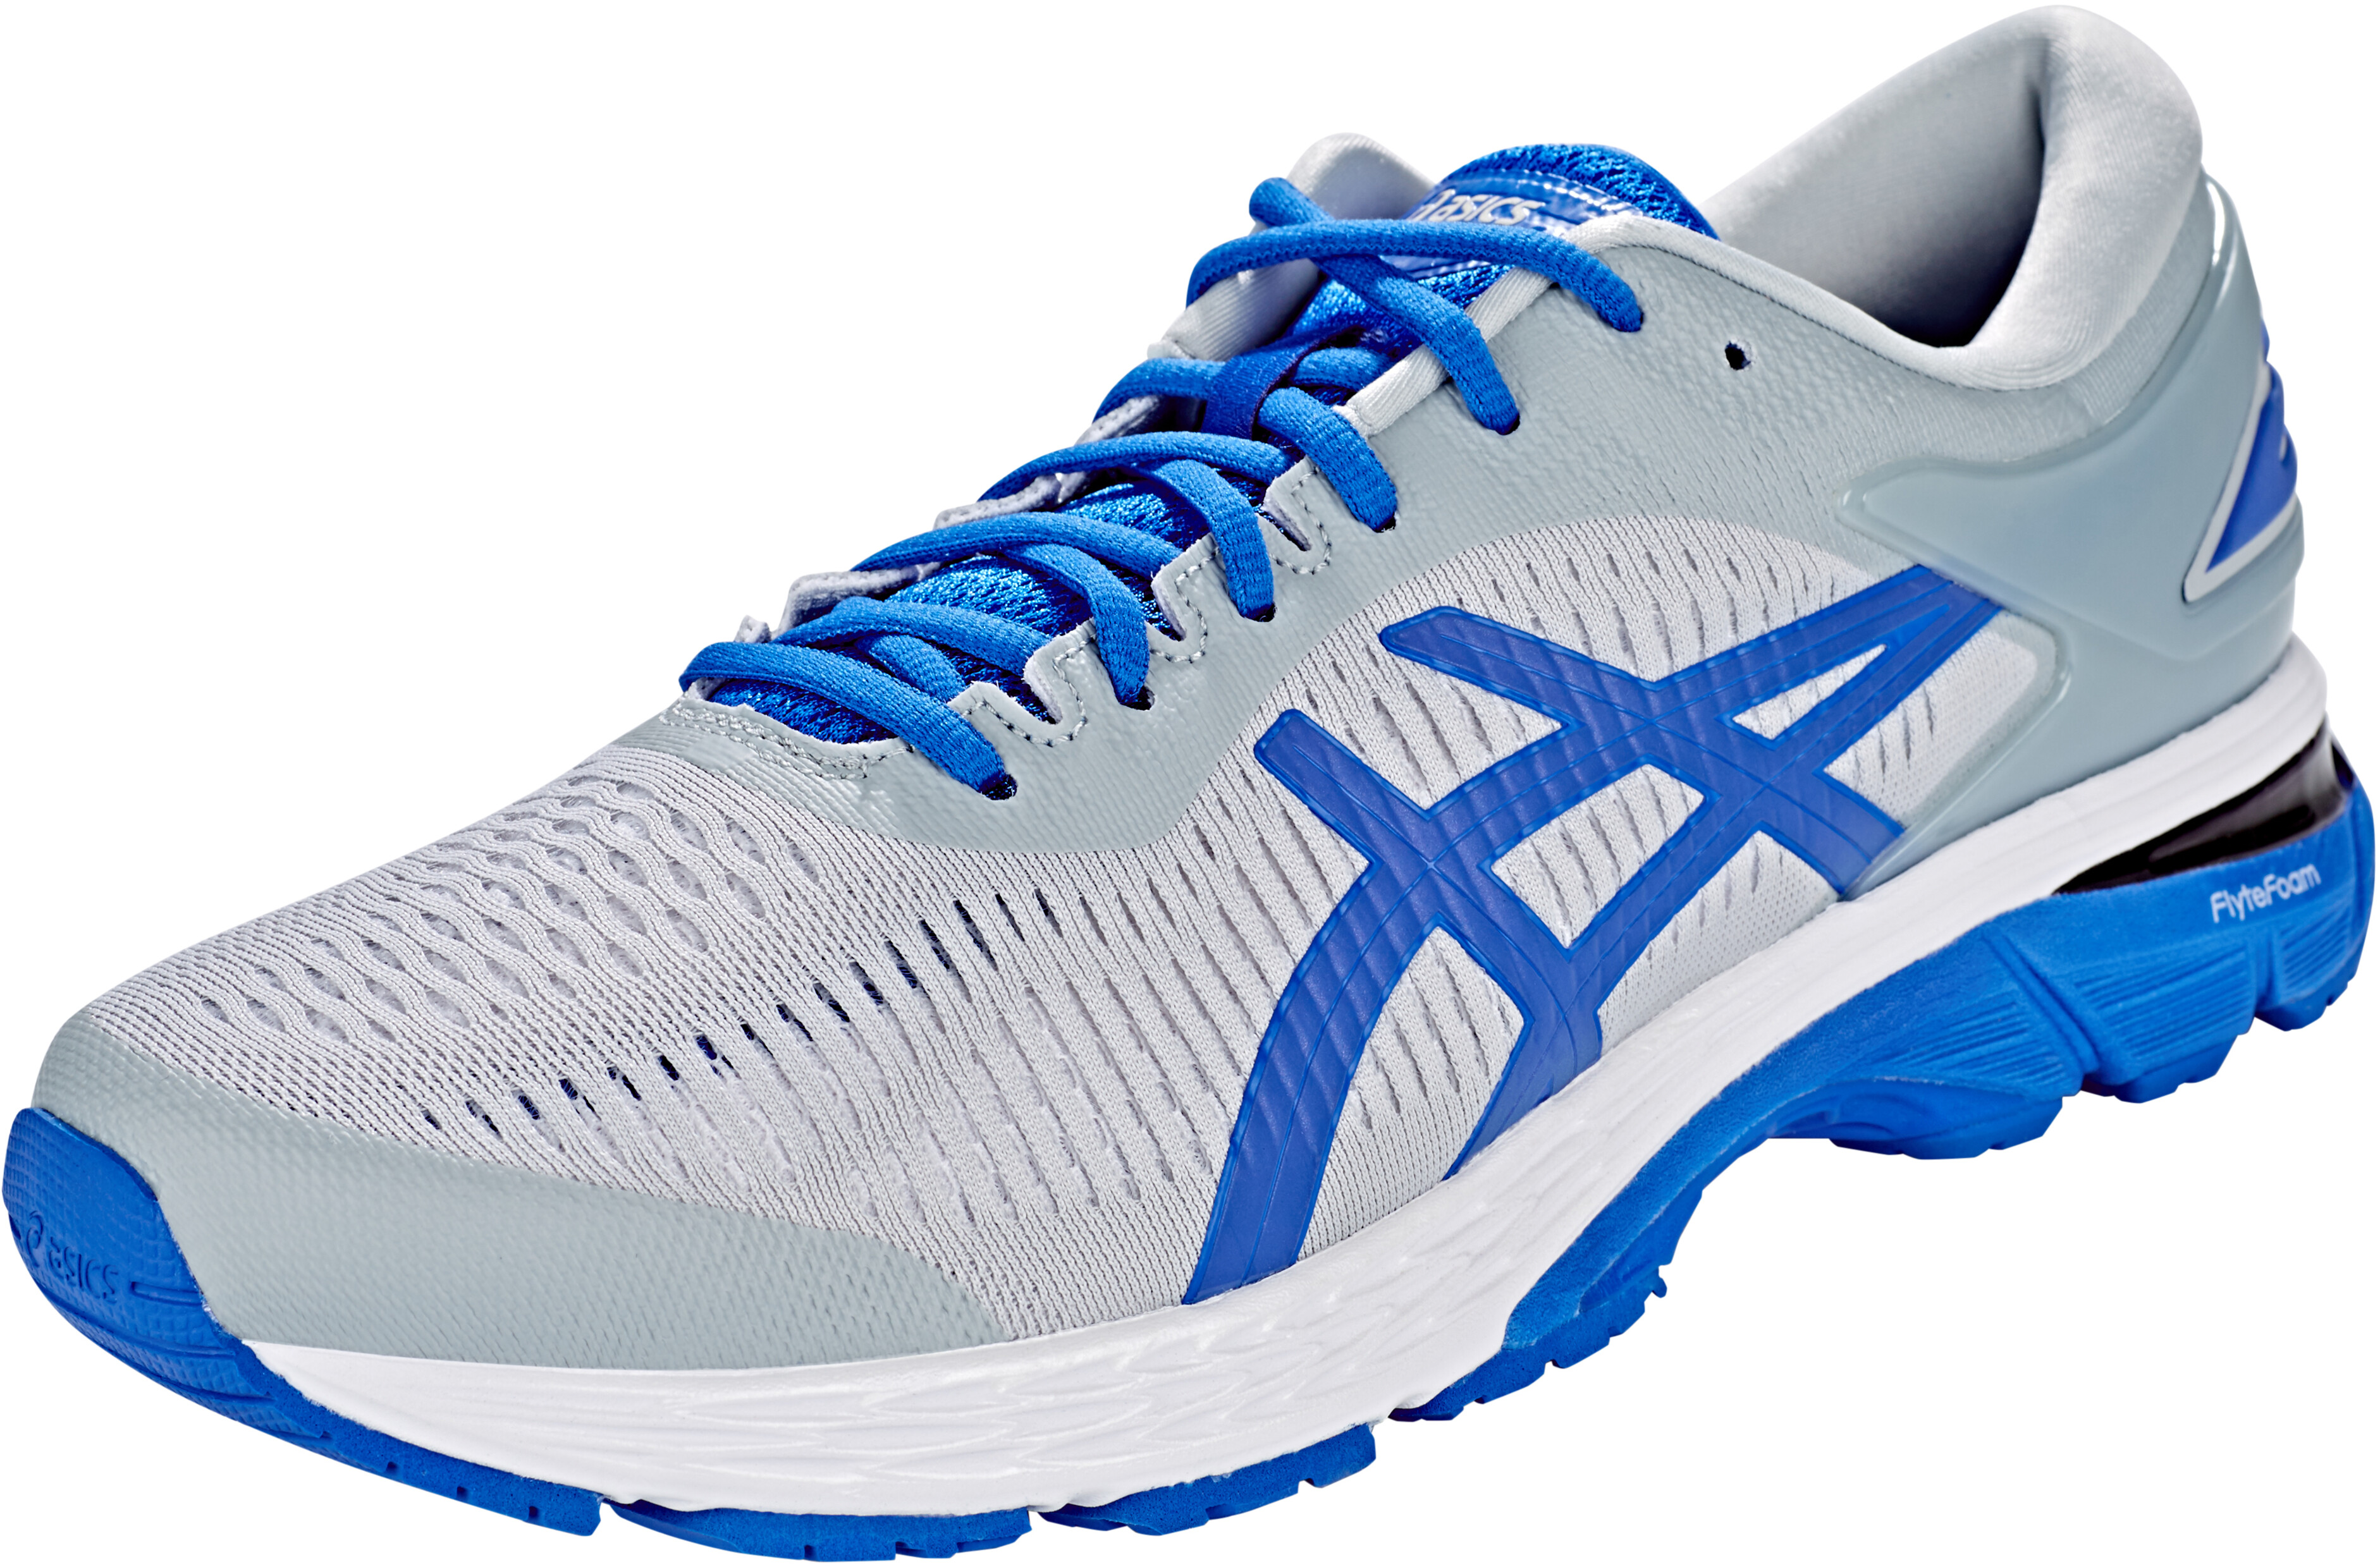 f3b162e4 asics Gel-Kayano 25 Lite-Show Shoes Men mid grey/illusion blue